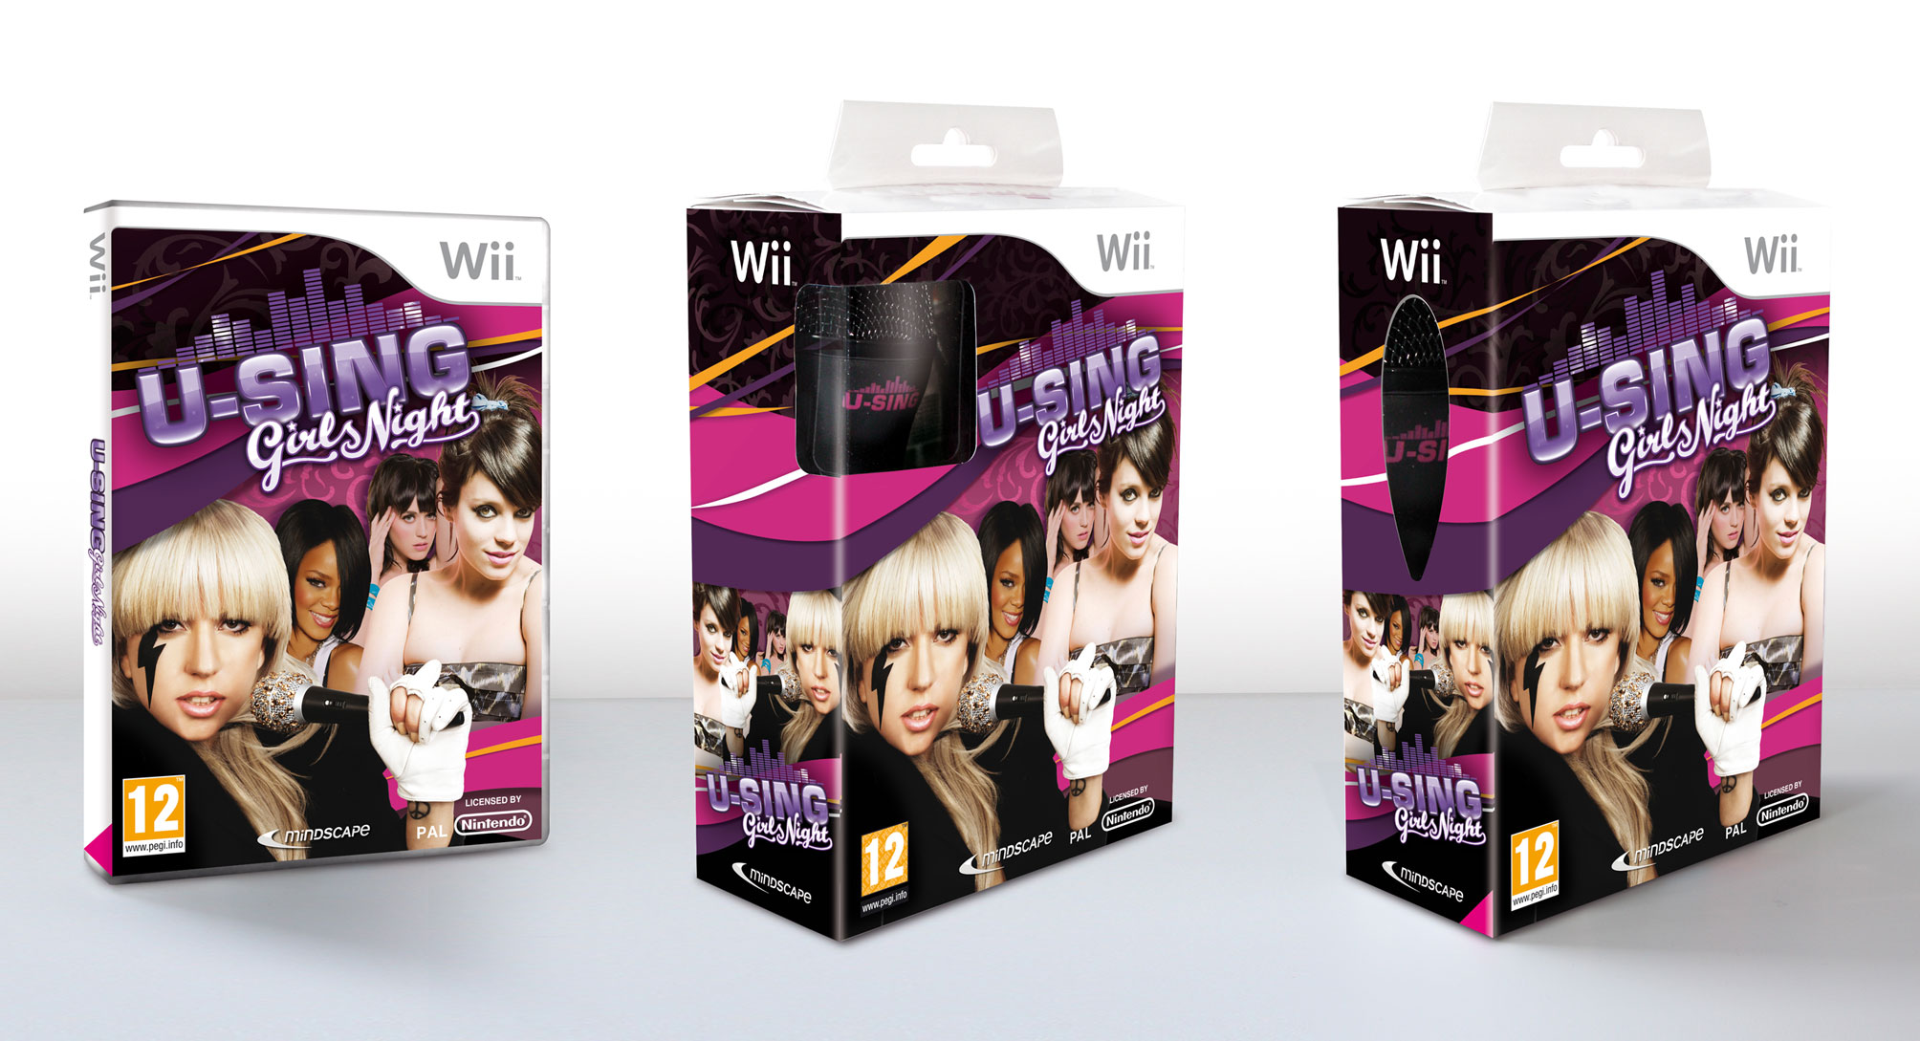 image-pack-using-02.jpg